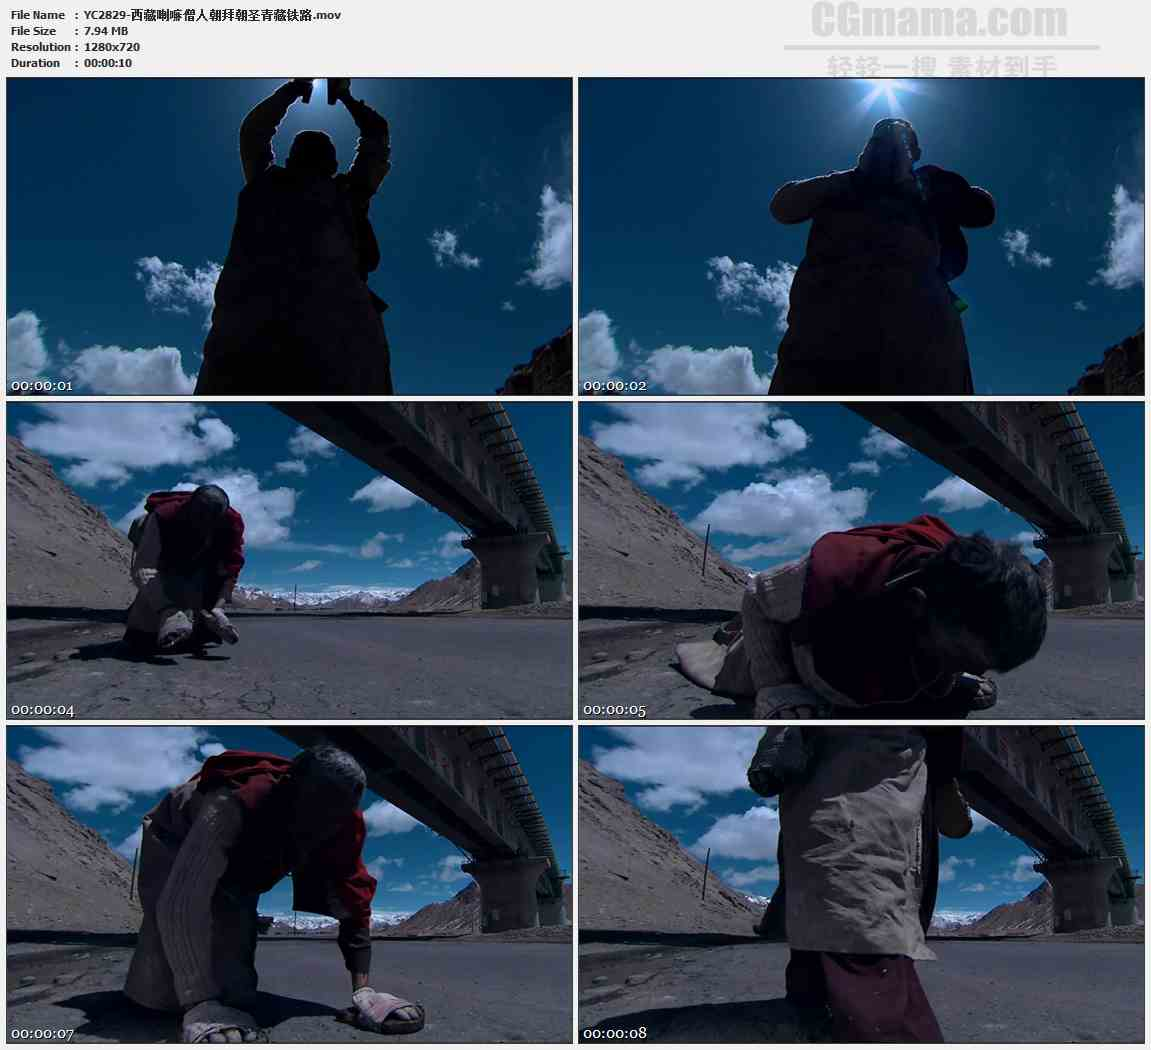 YC2829-西藏喇嘛僧人朝拜朝圣青藏铁路高清实拍视频素材